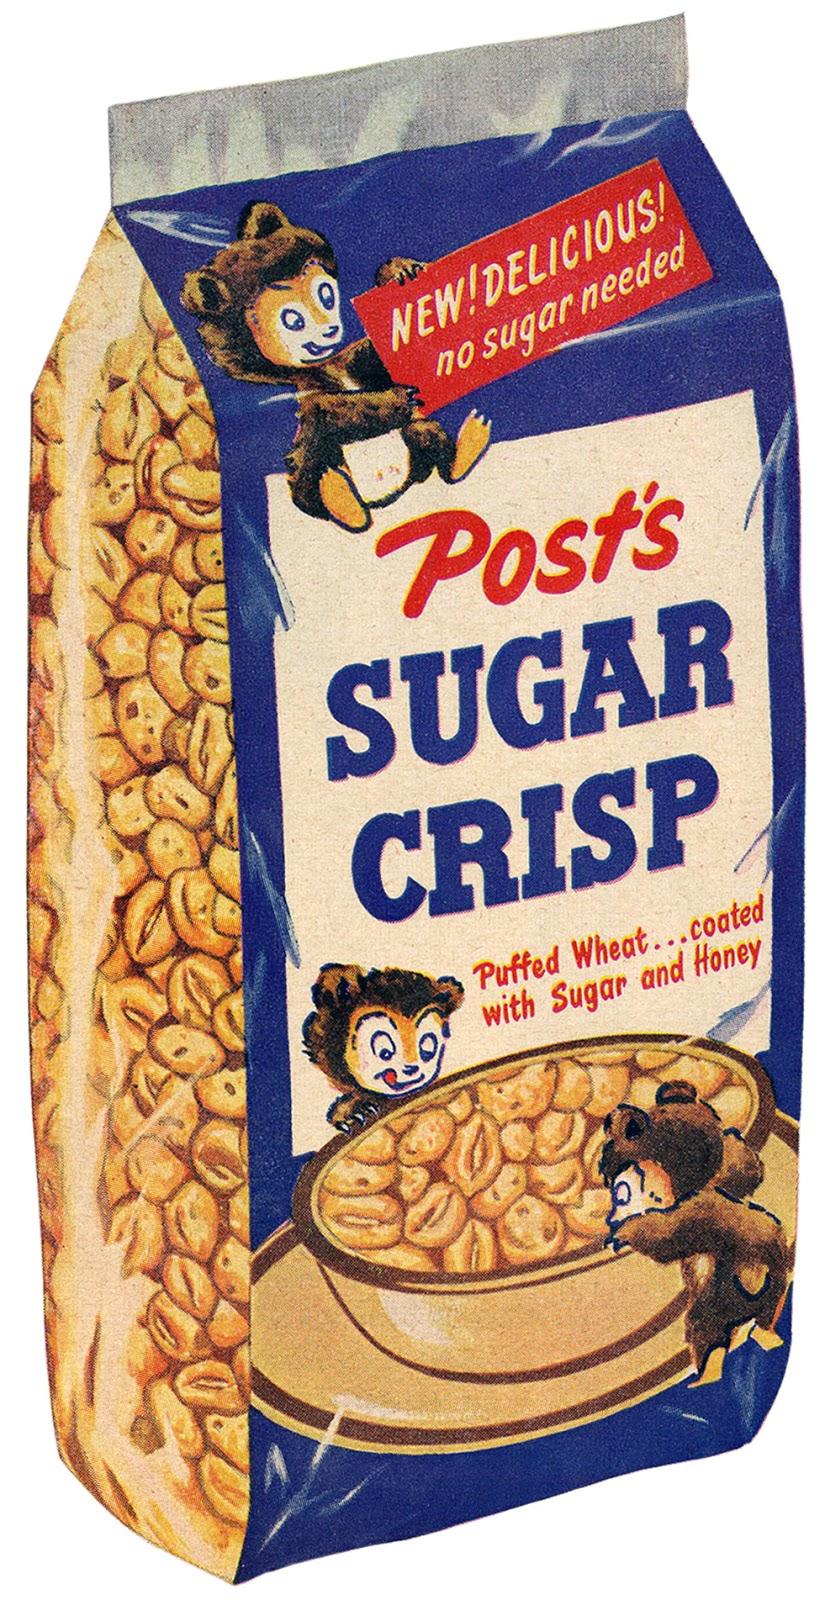 can t get enough of that sugar crisp